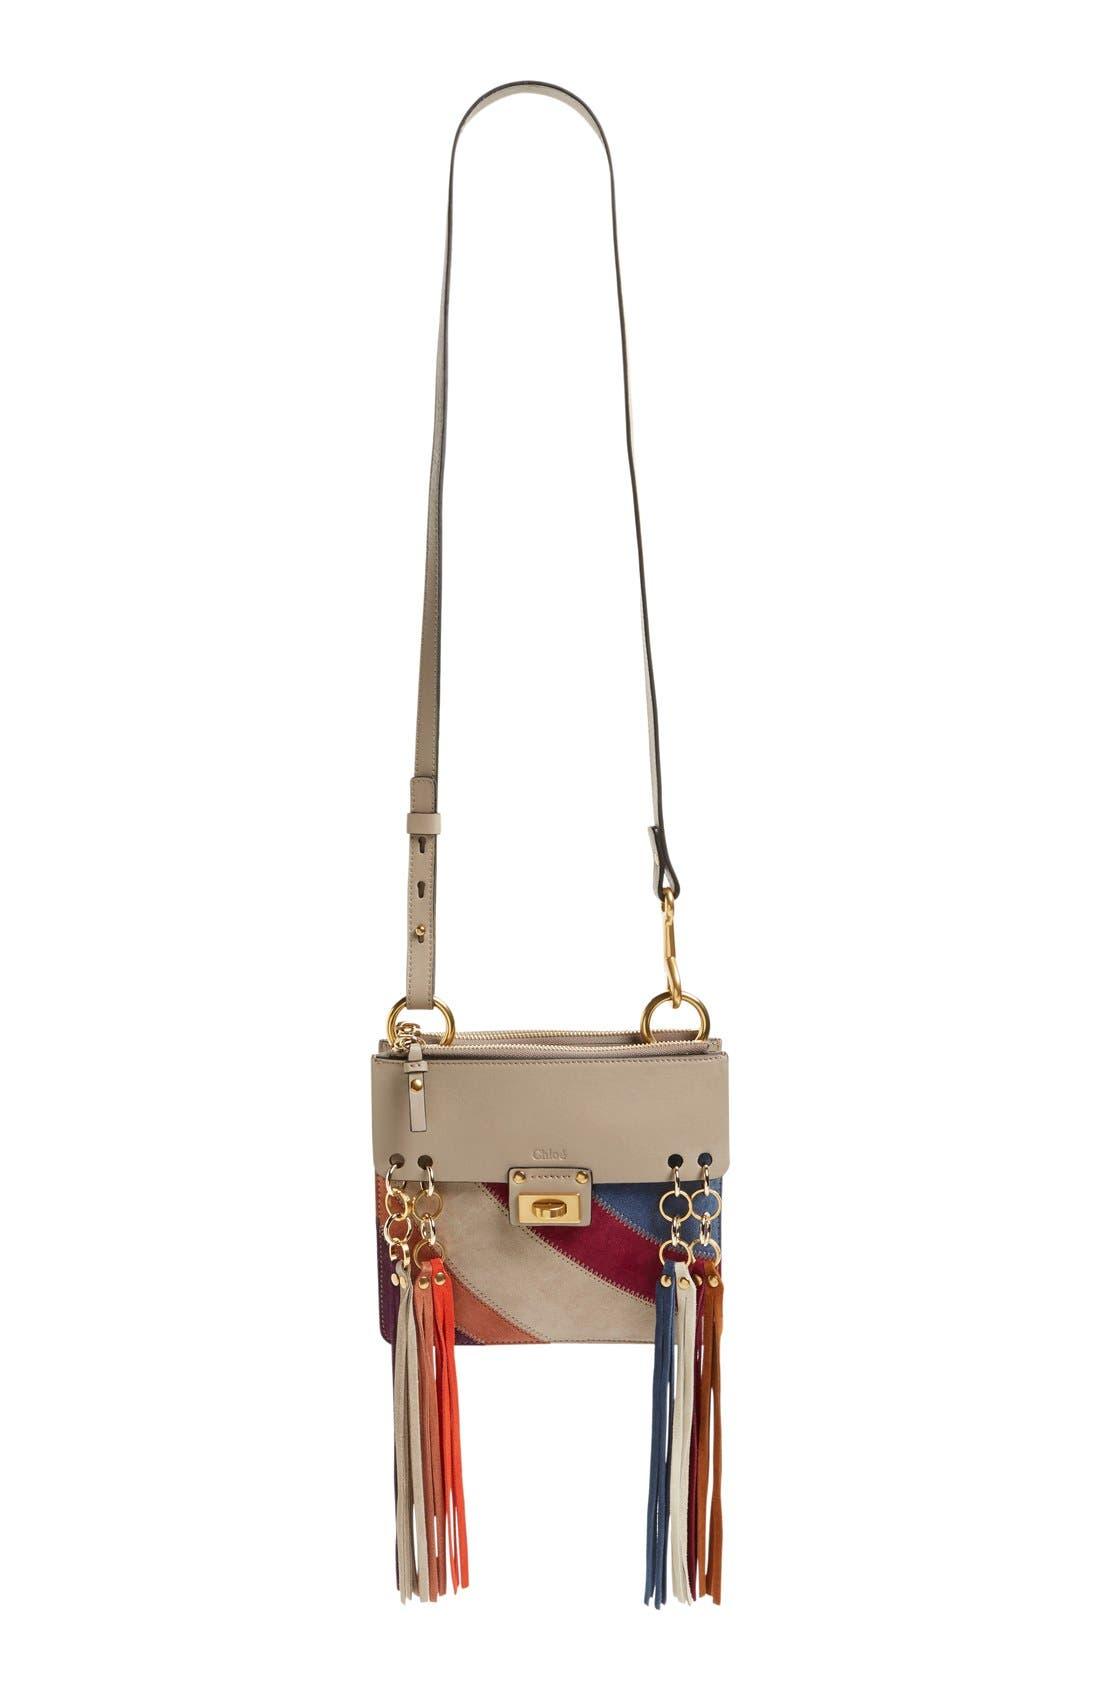 Alternate Image 3  - Chloé 'Small Jane' Suede Fringe Patchwork Leather Crossbody Bag